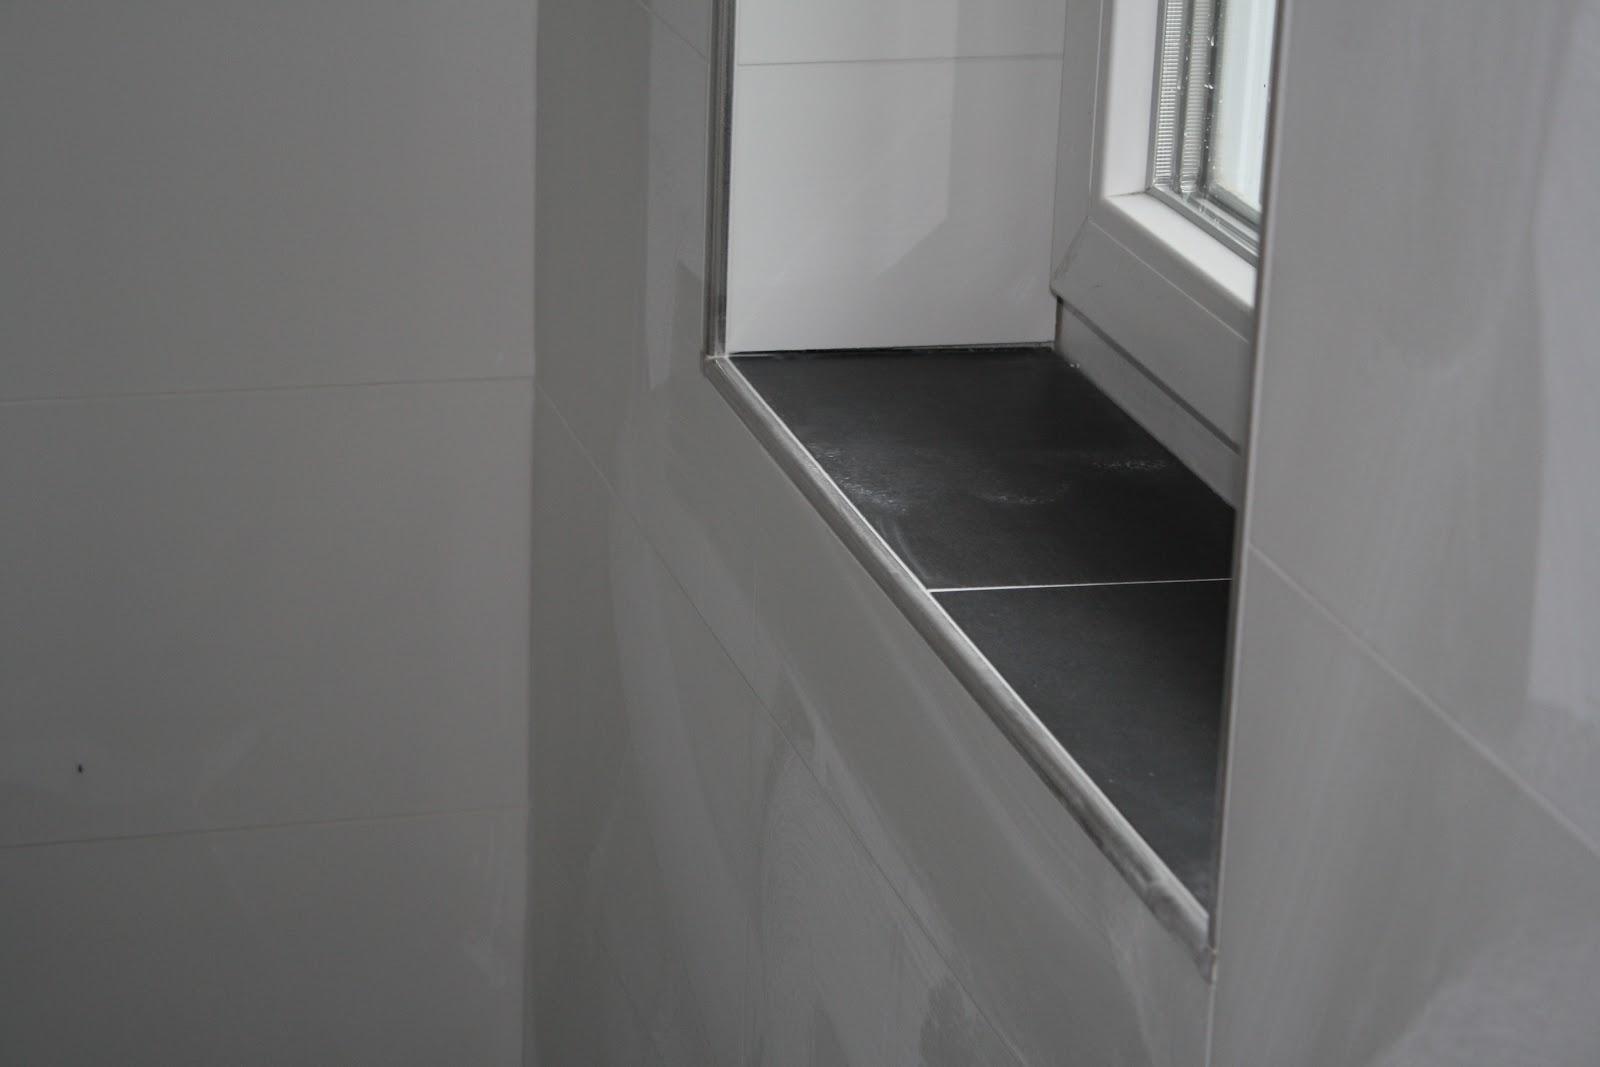 Fensterbank Fliesen